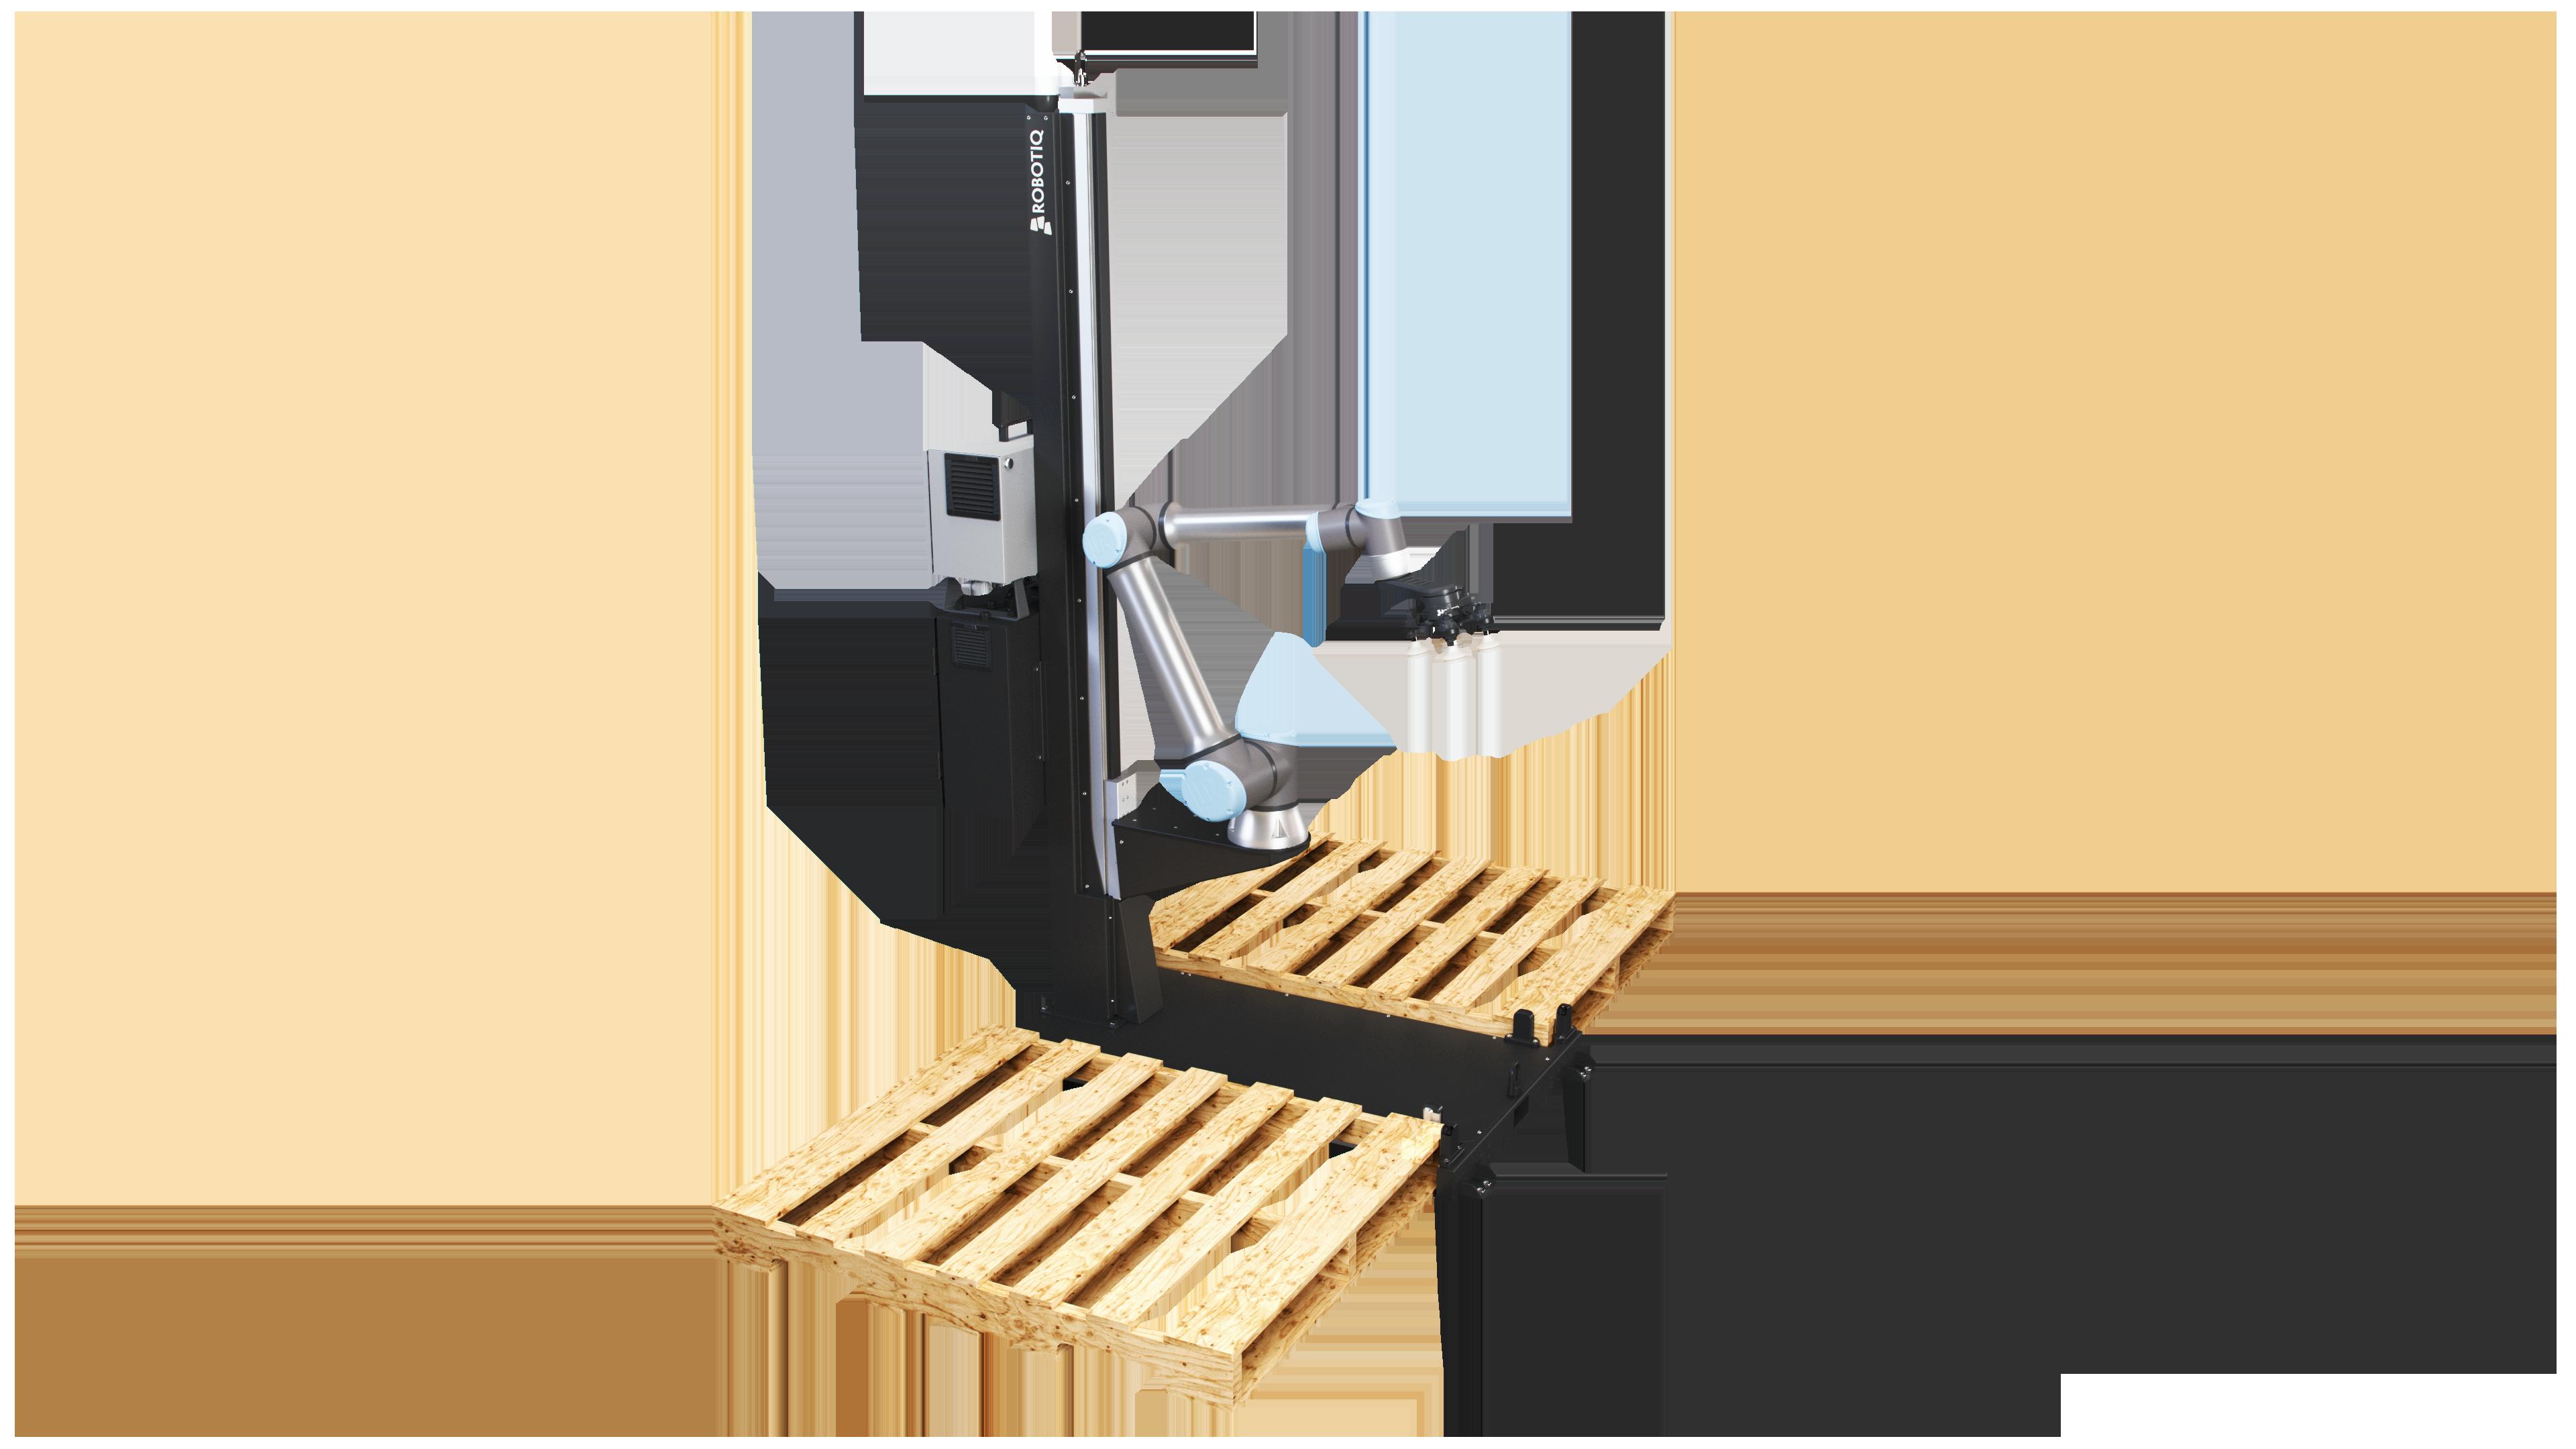 391282 05 2021 robotiq palletizing solution 15fdb3 original 1621327875